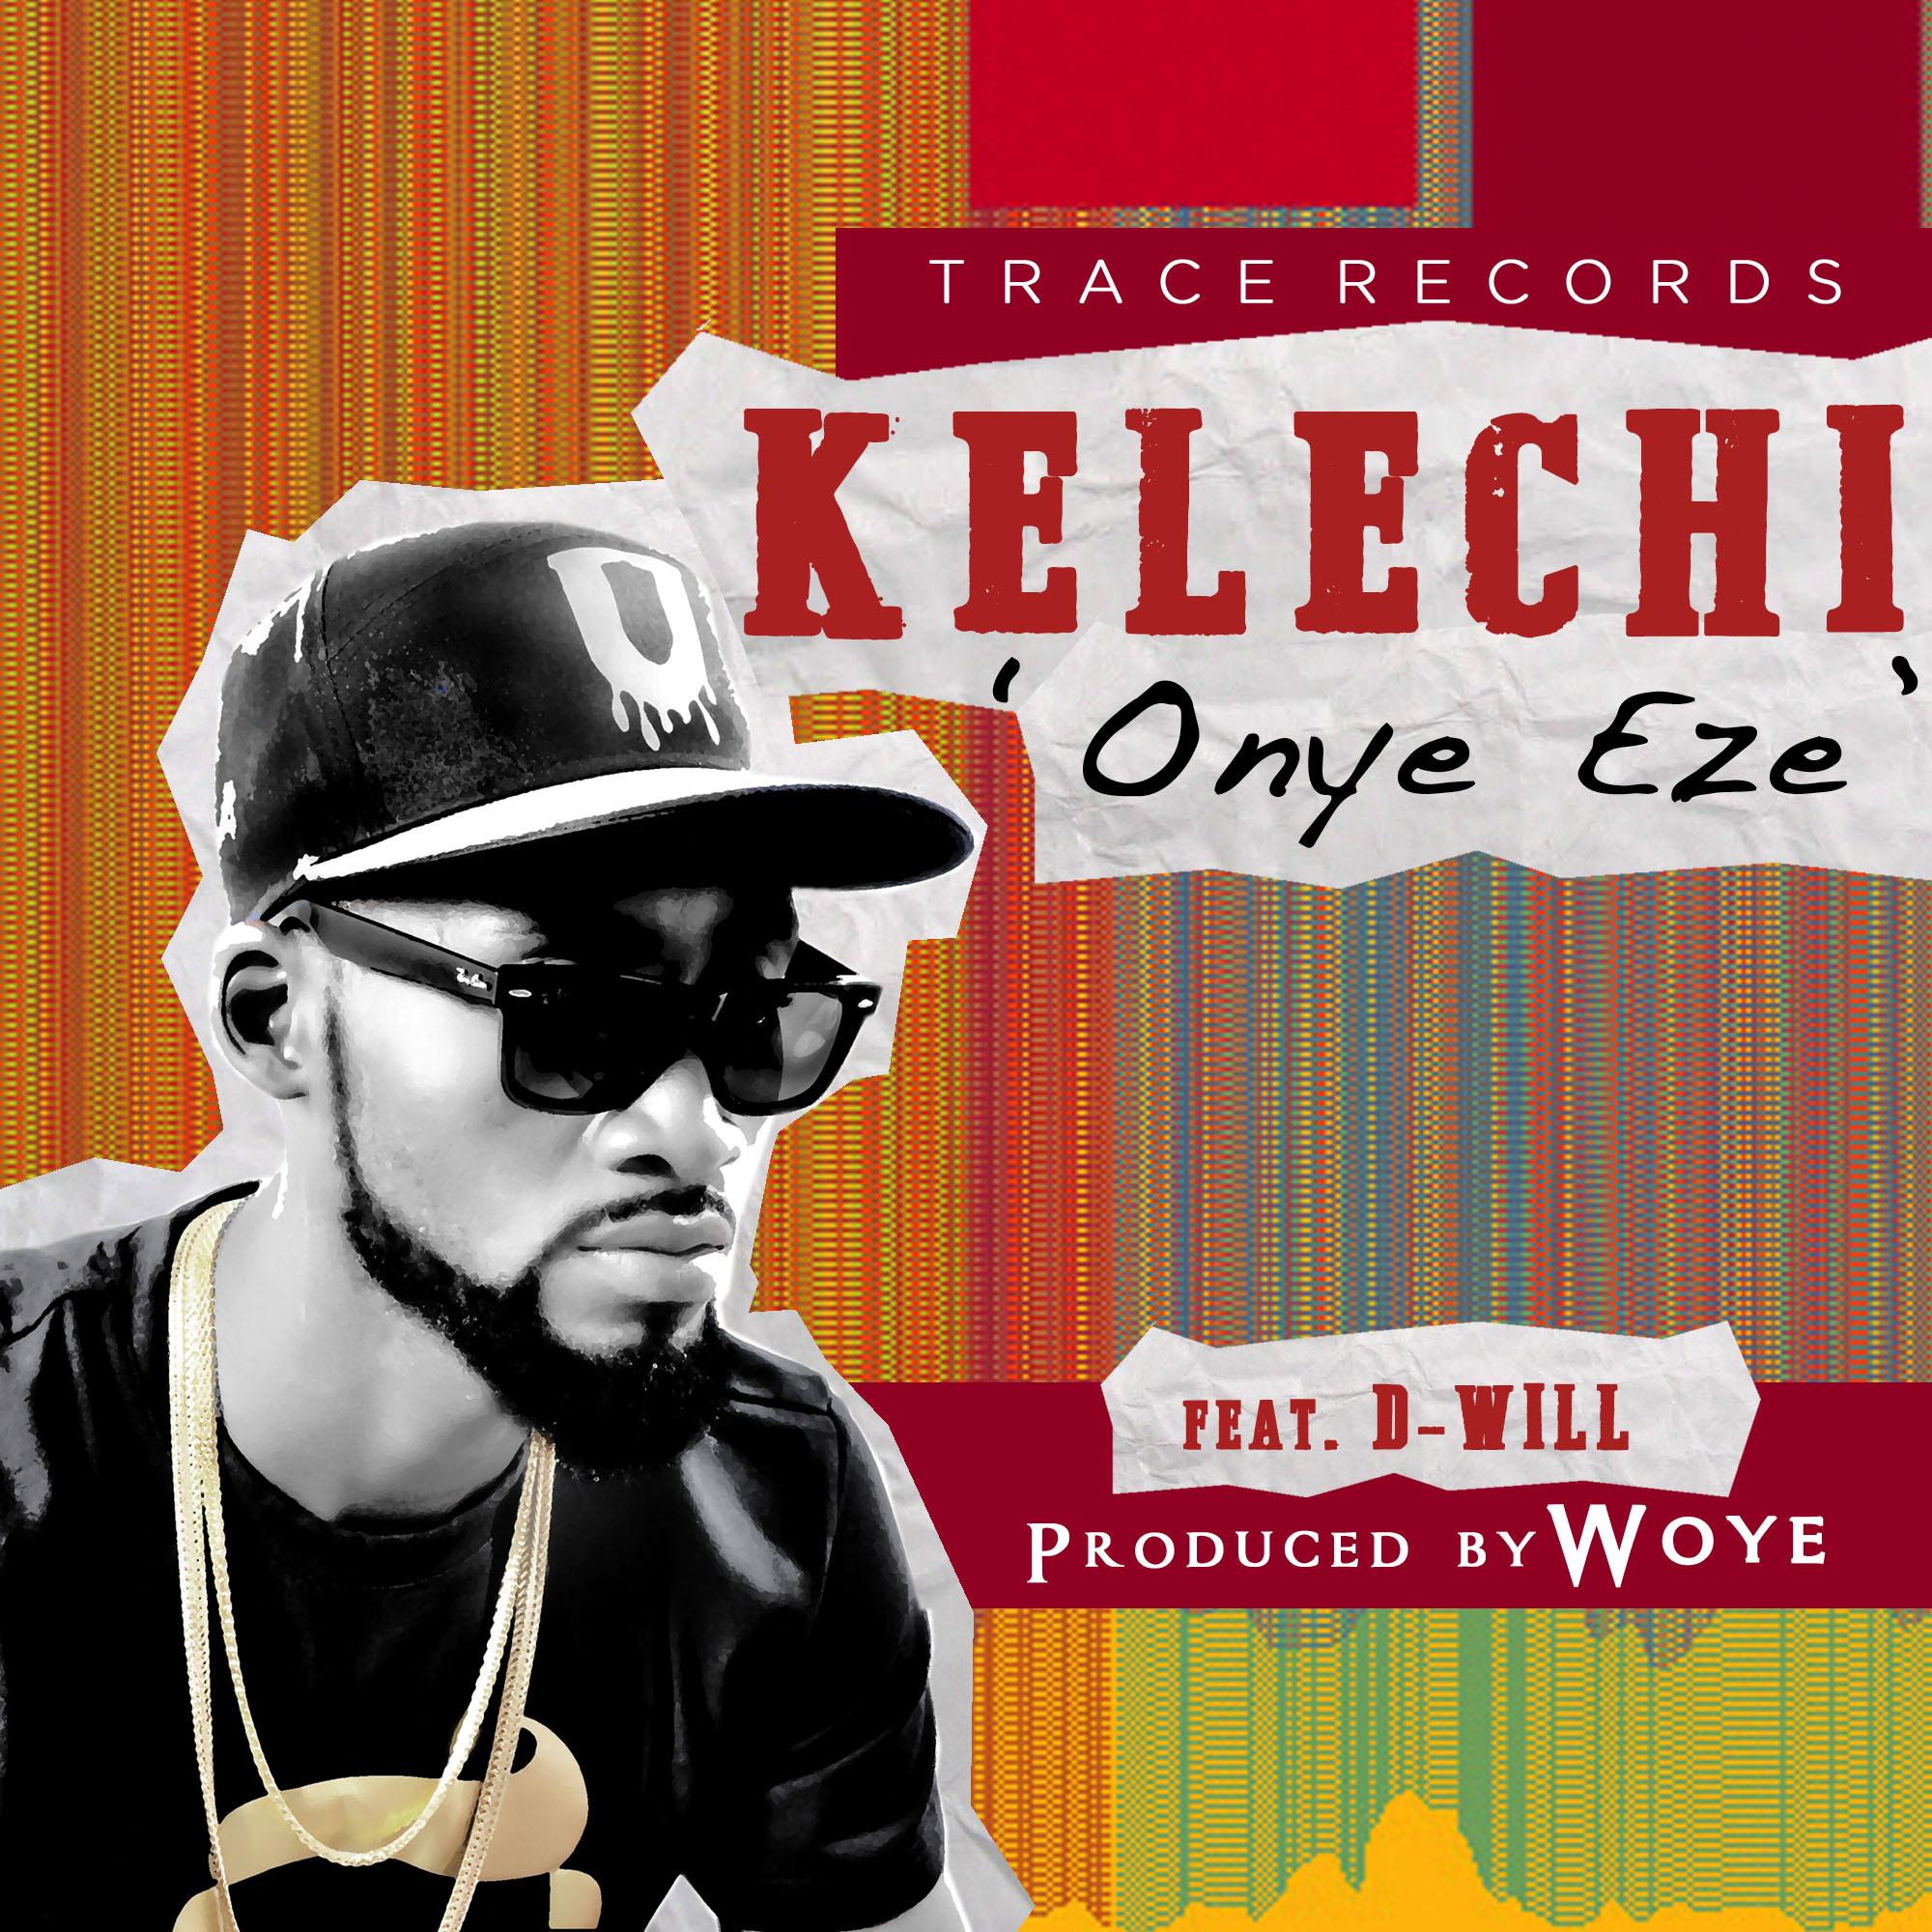 Kelechi - Onye-Eze-Art